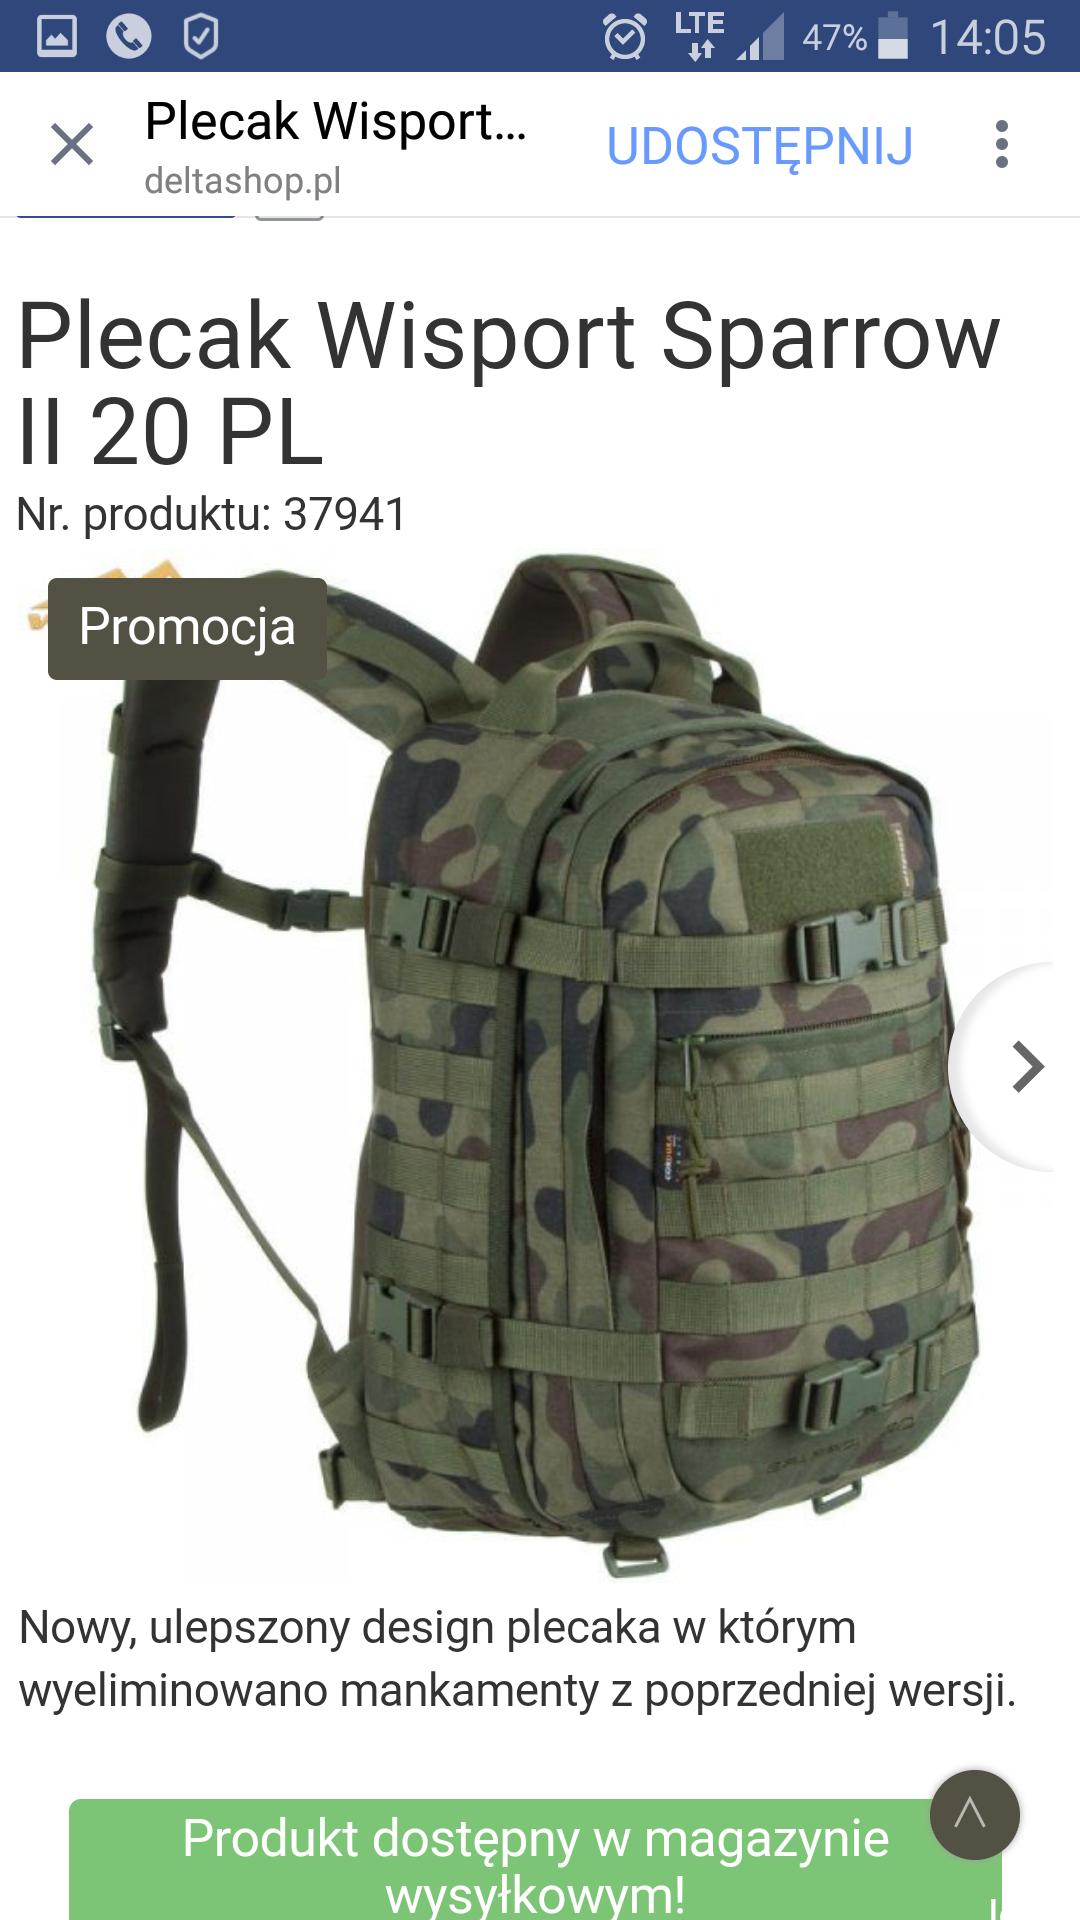 Plecaki Wisport i militaria